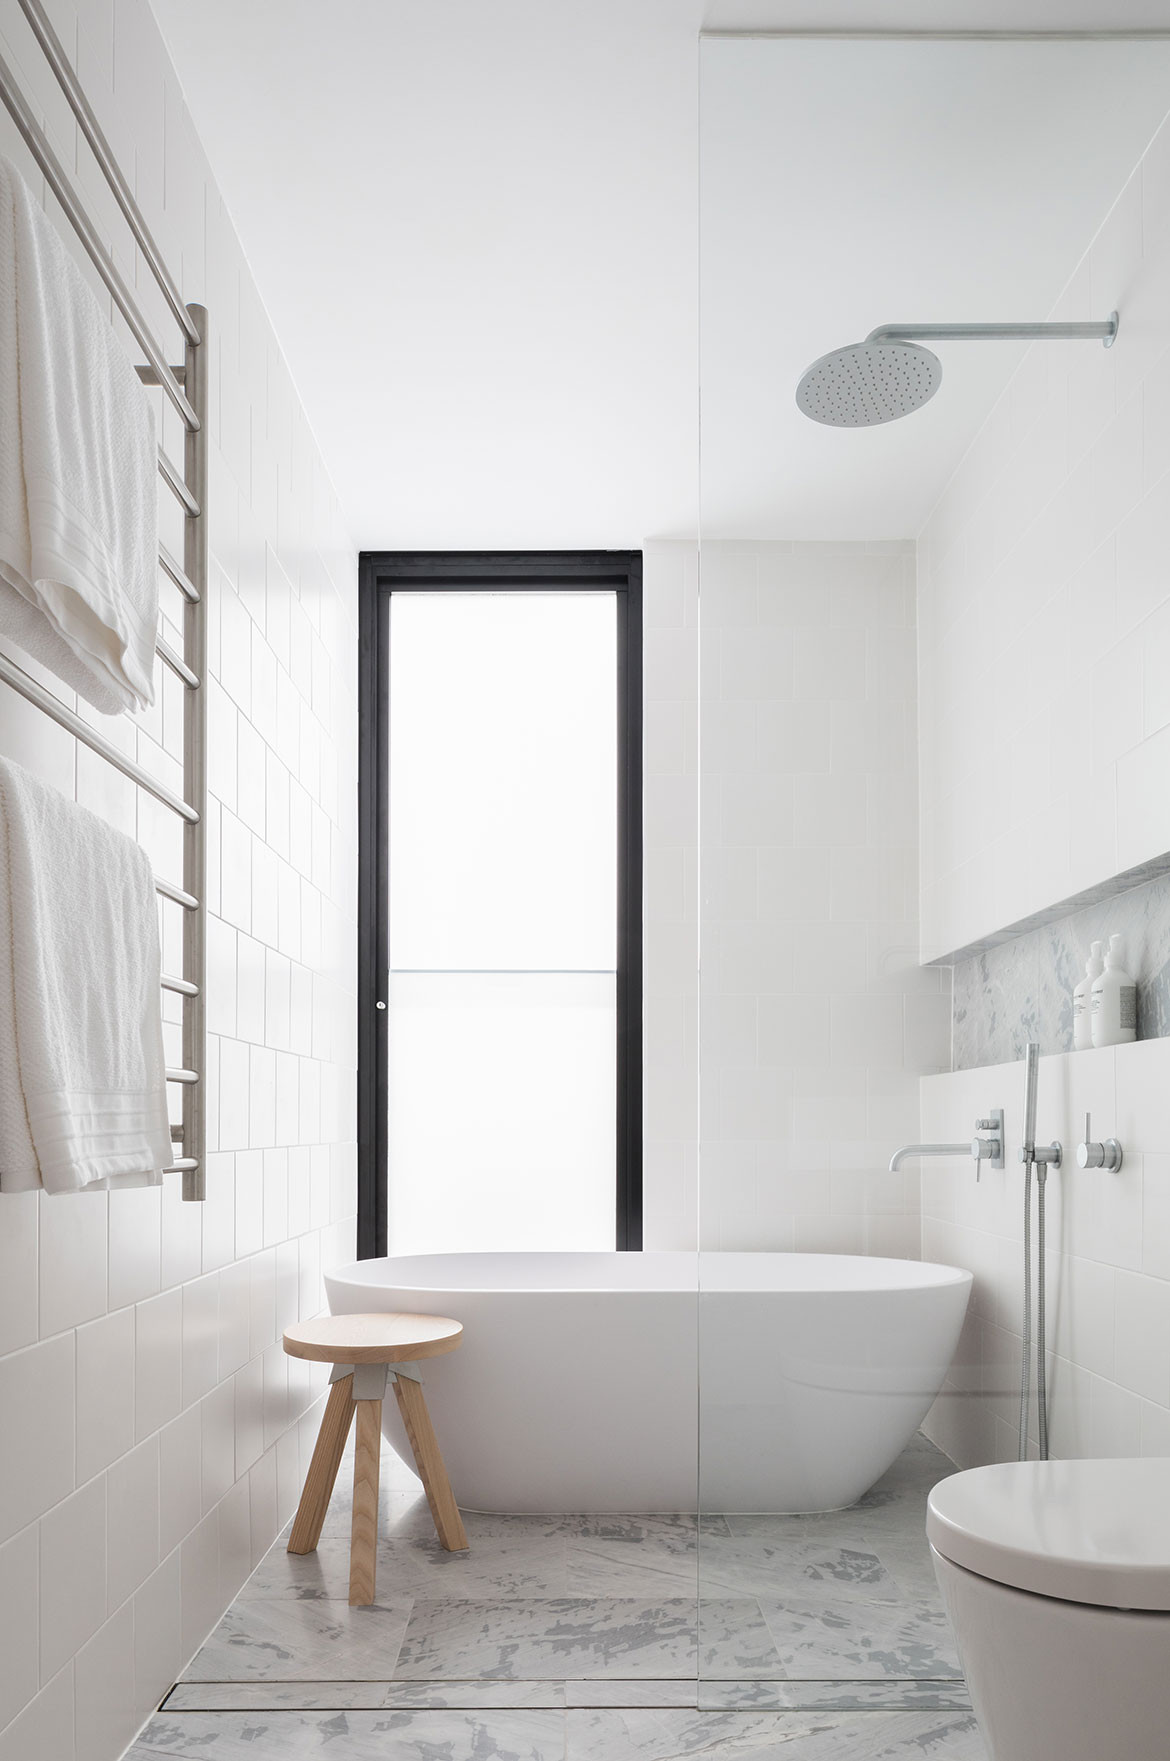 Bronte Residence cm studio cc Katherine Lu bathroom